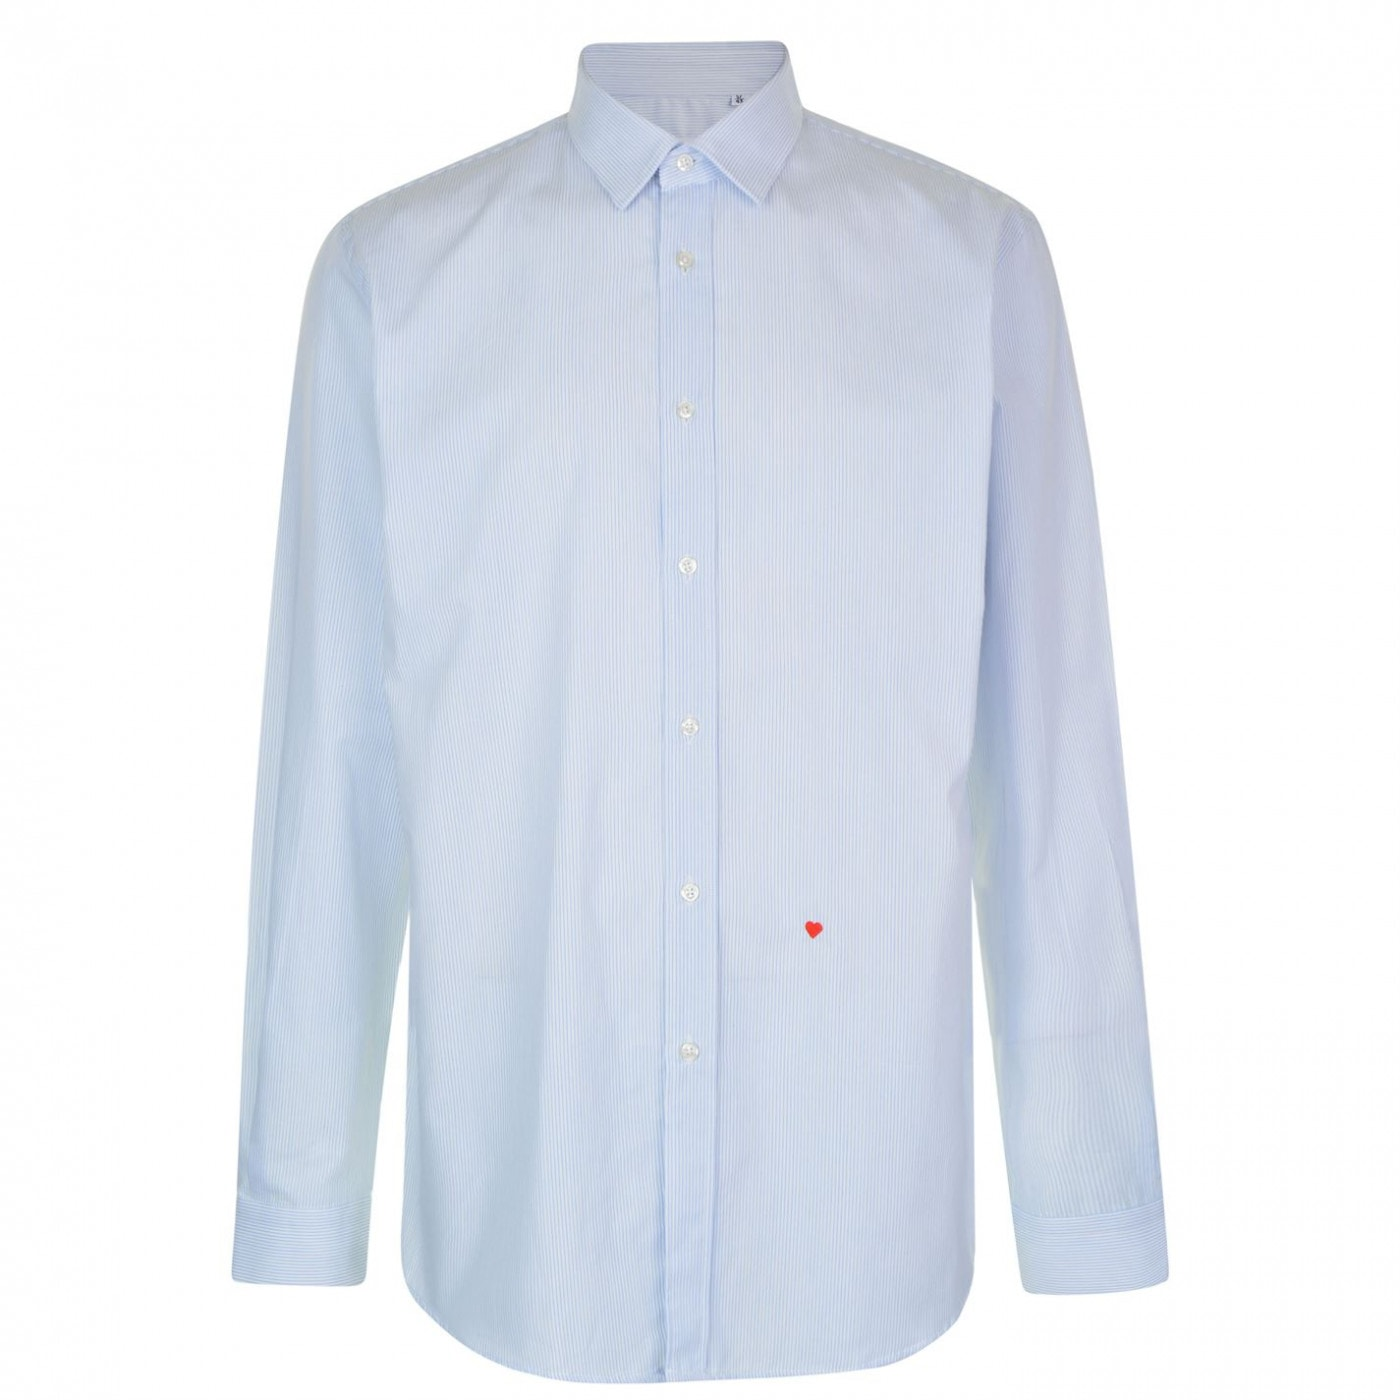 Moschino Long Sleeved Shirt